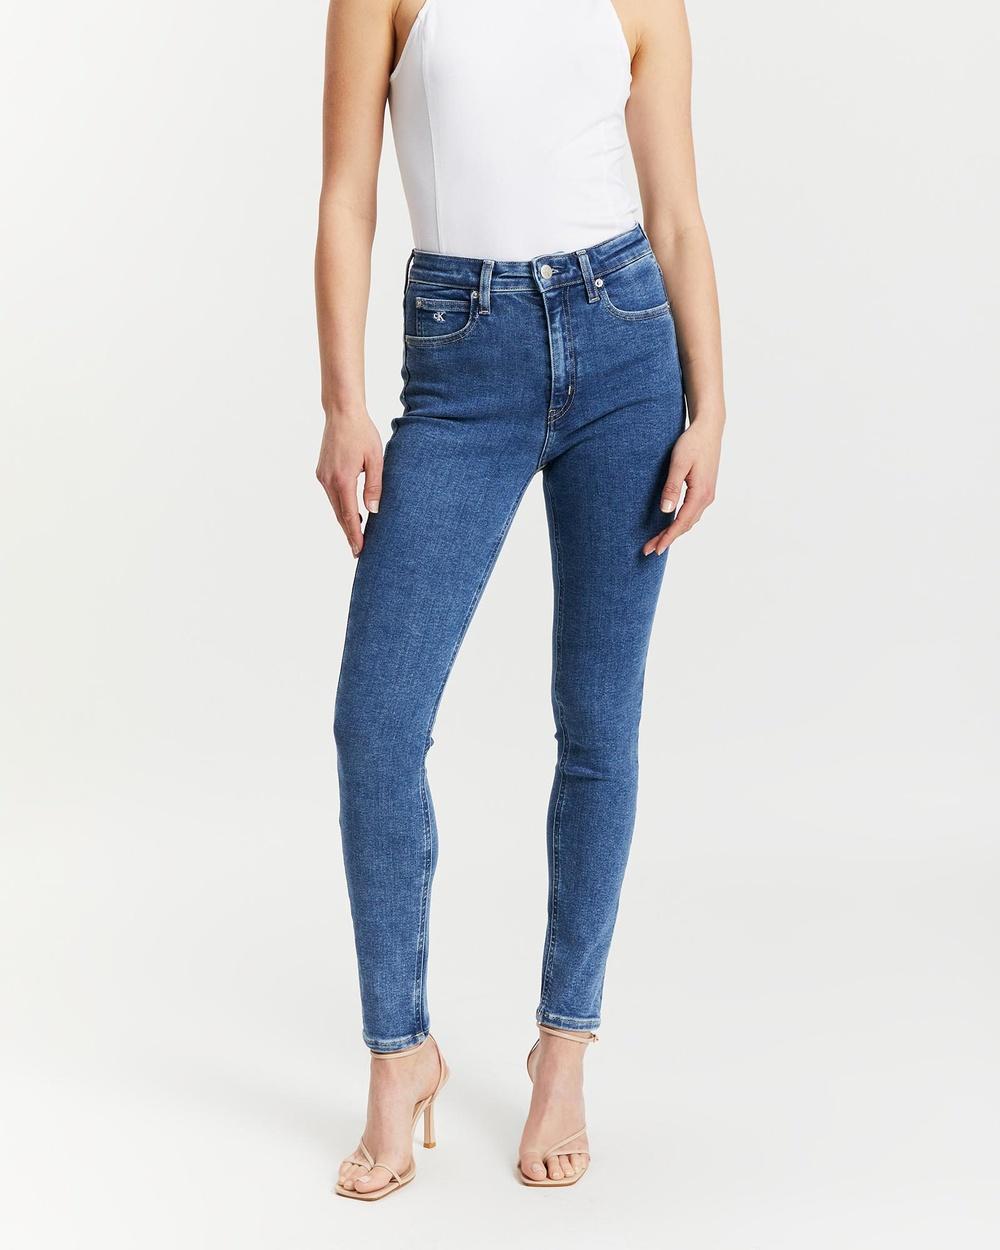 Calvin Klein High Rise Skinny Jeans High-Waisted Blue Australia